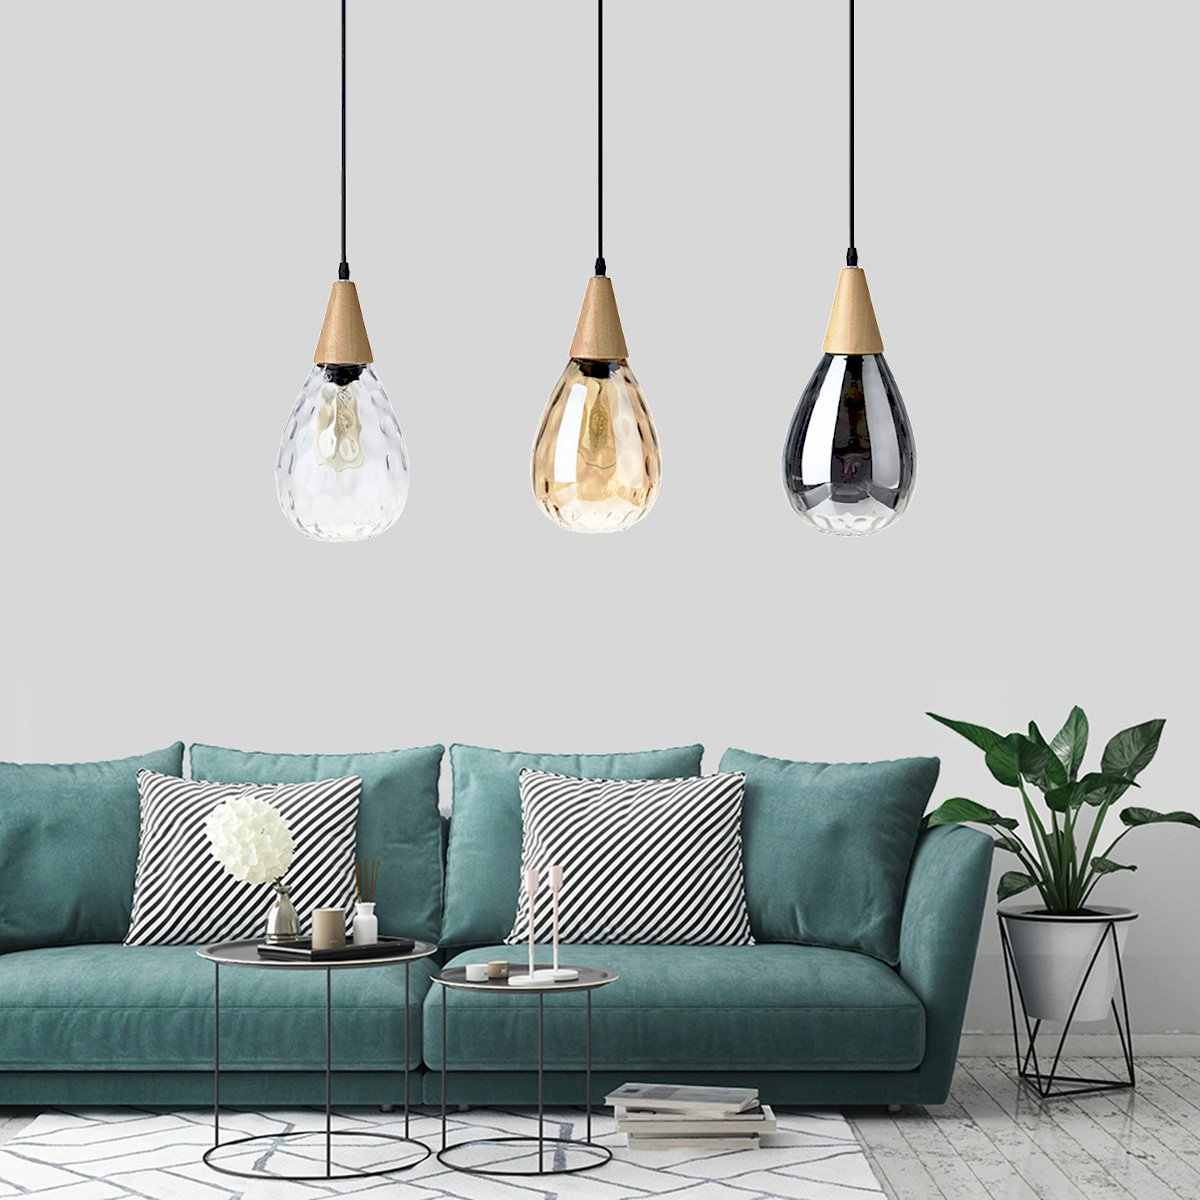 Modern Kaca Liontin Lampu Lampu Ruang Tamu Dekorasi Rumah Restoran Pencahayaan Gantung Rumah Bar Kaca DROP Perlengkapan E27 220V